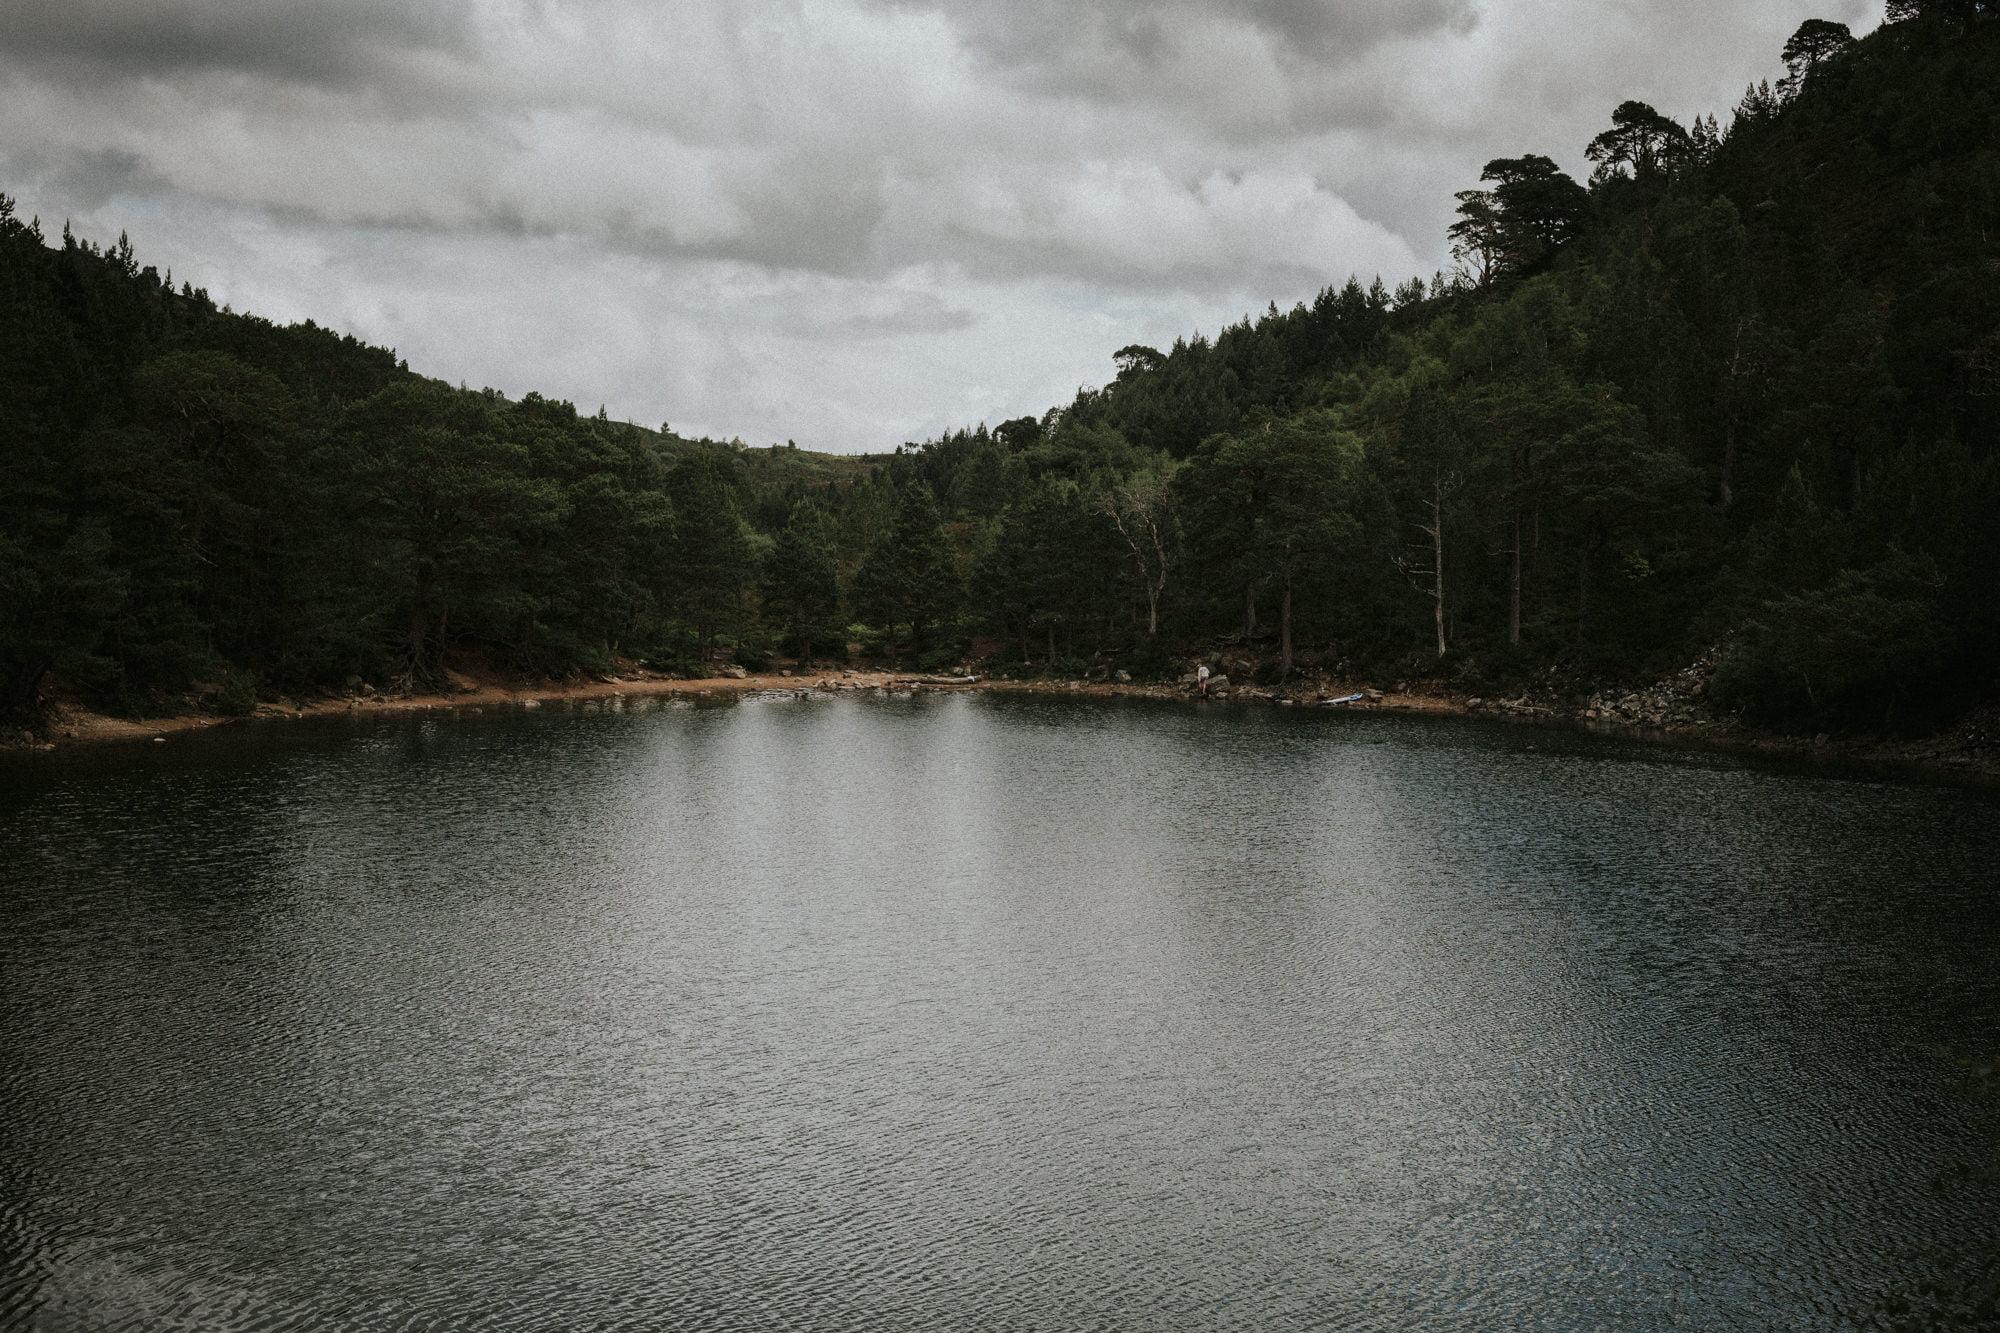 An Lochan Uaine elopement, Green Loch elopement, Aviemore elopement, Cairngorms elopement in the Scottish Highlands Lochs